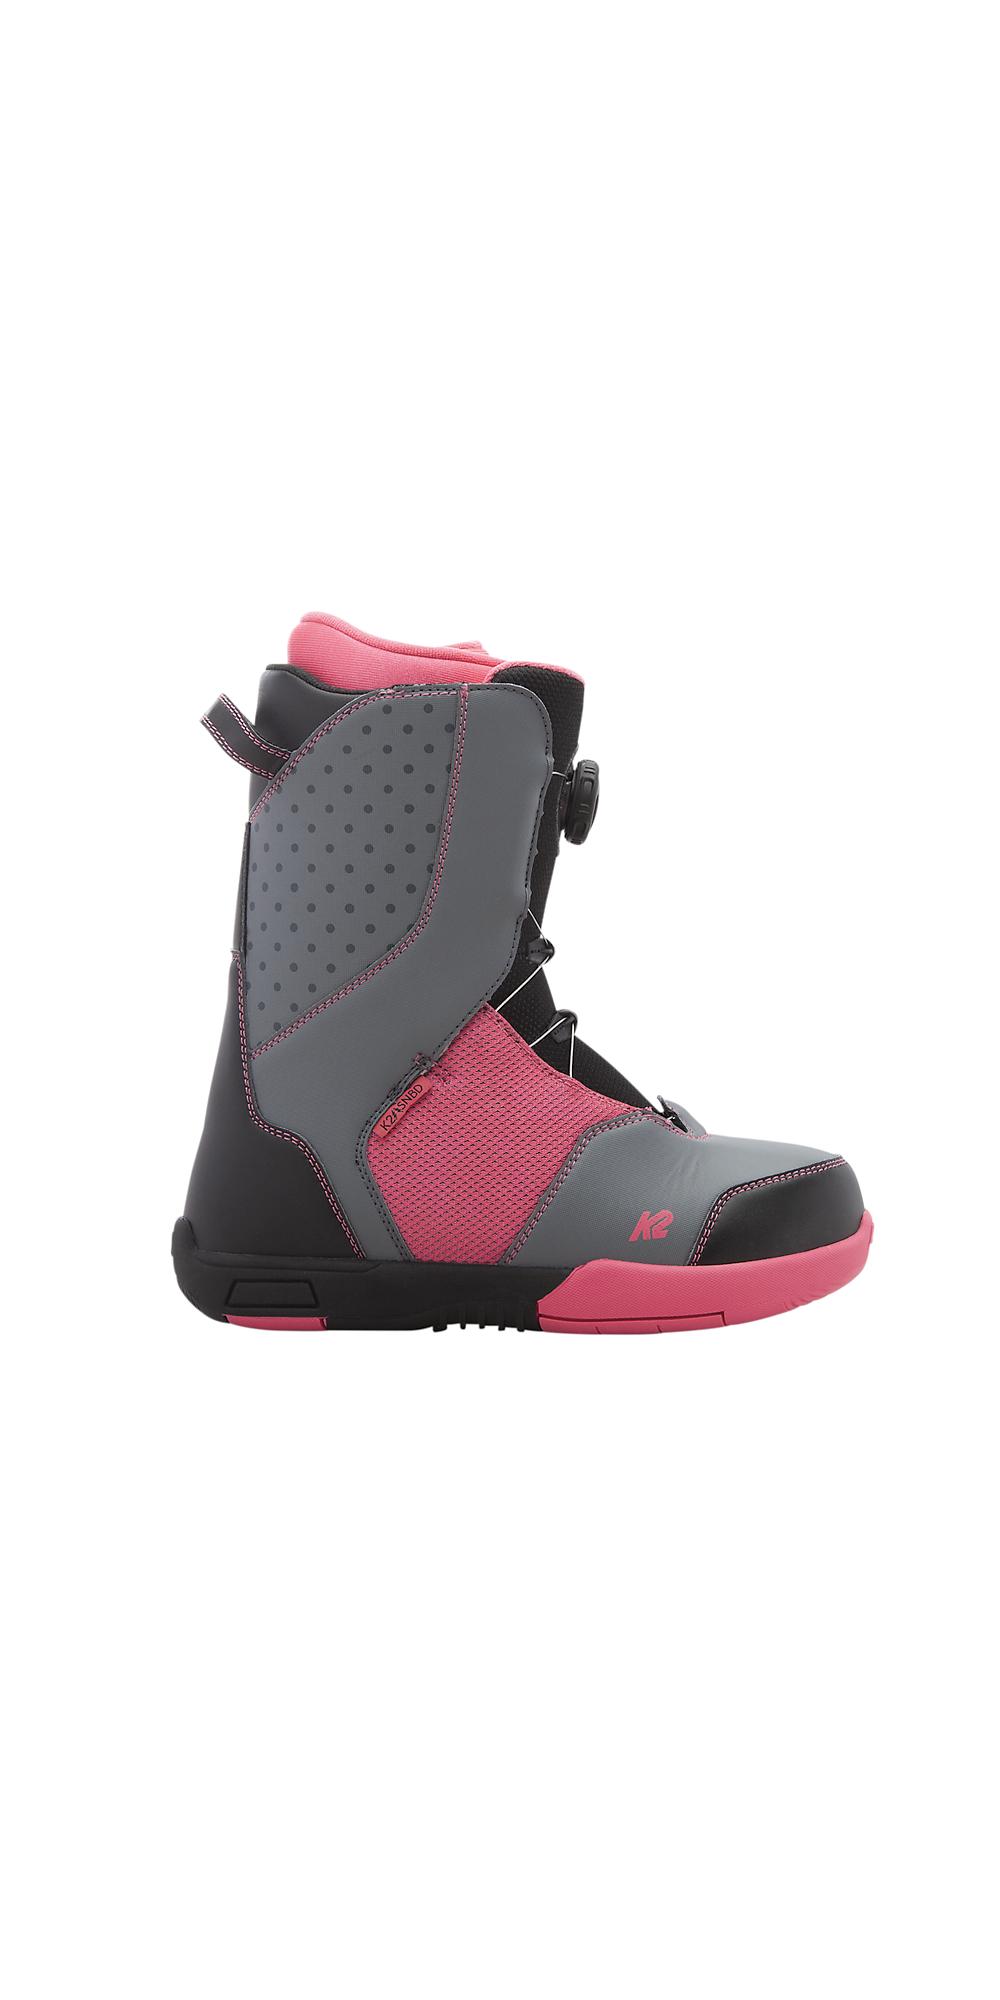 e4738db73419 Kat Boot - K2 Snowboarding